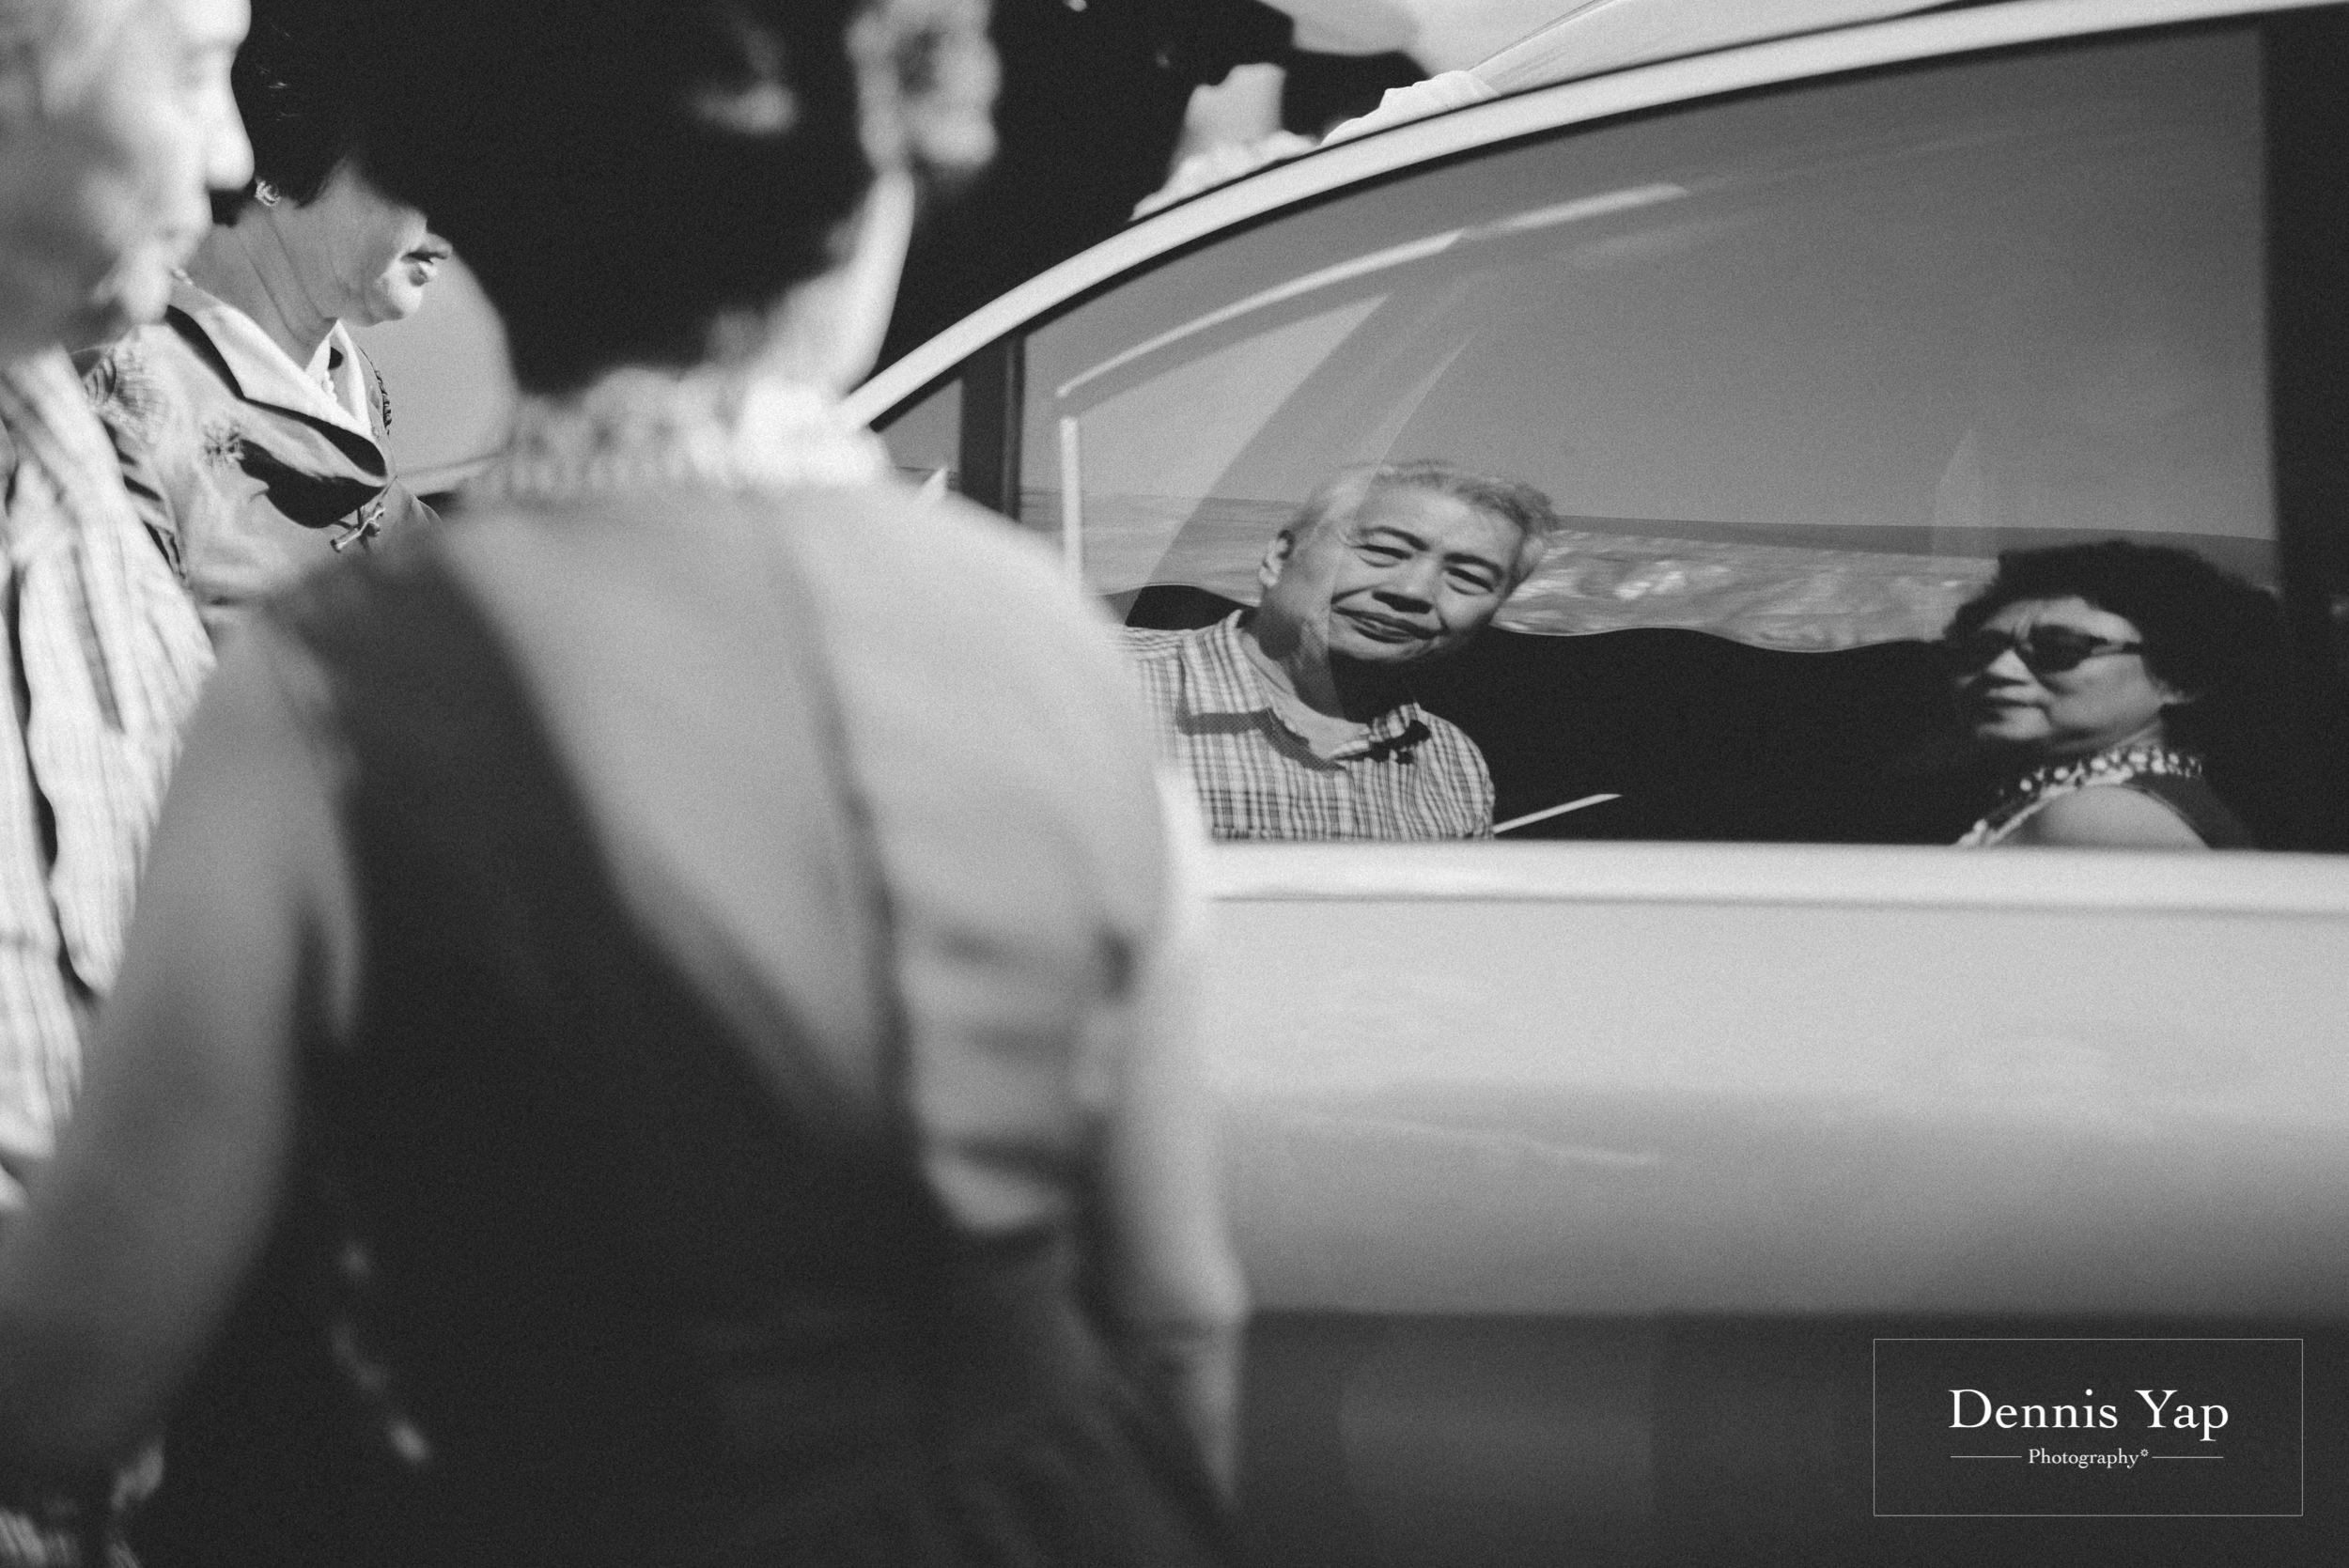 chuan wai angela wedding day bukit jelutong selangor malaysia dennis yap photography-8.jpg